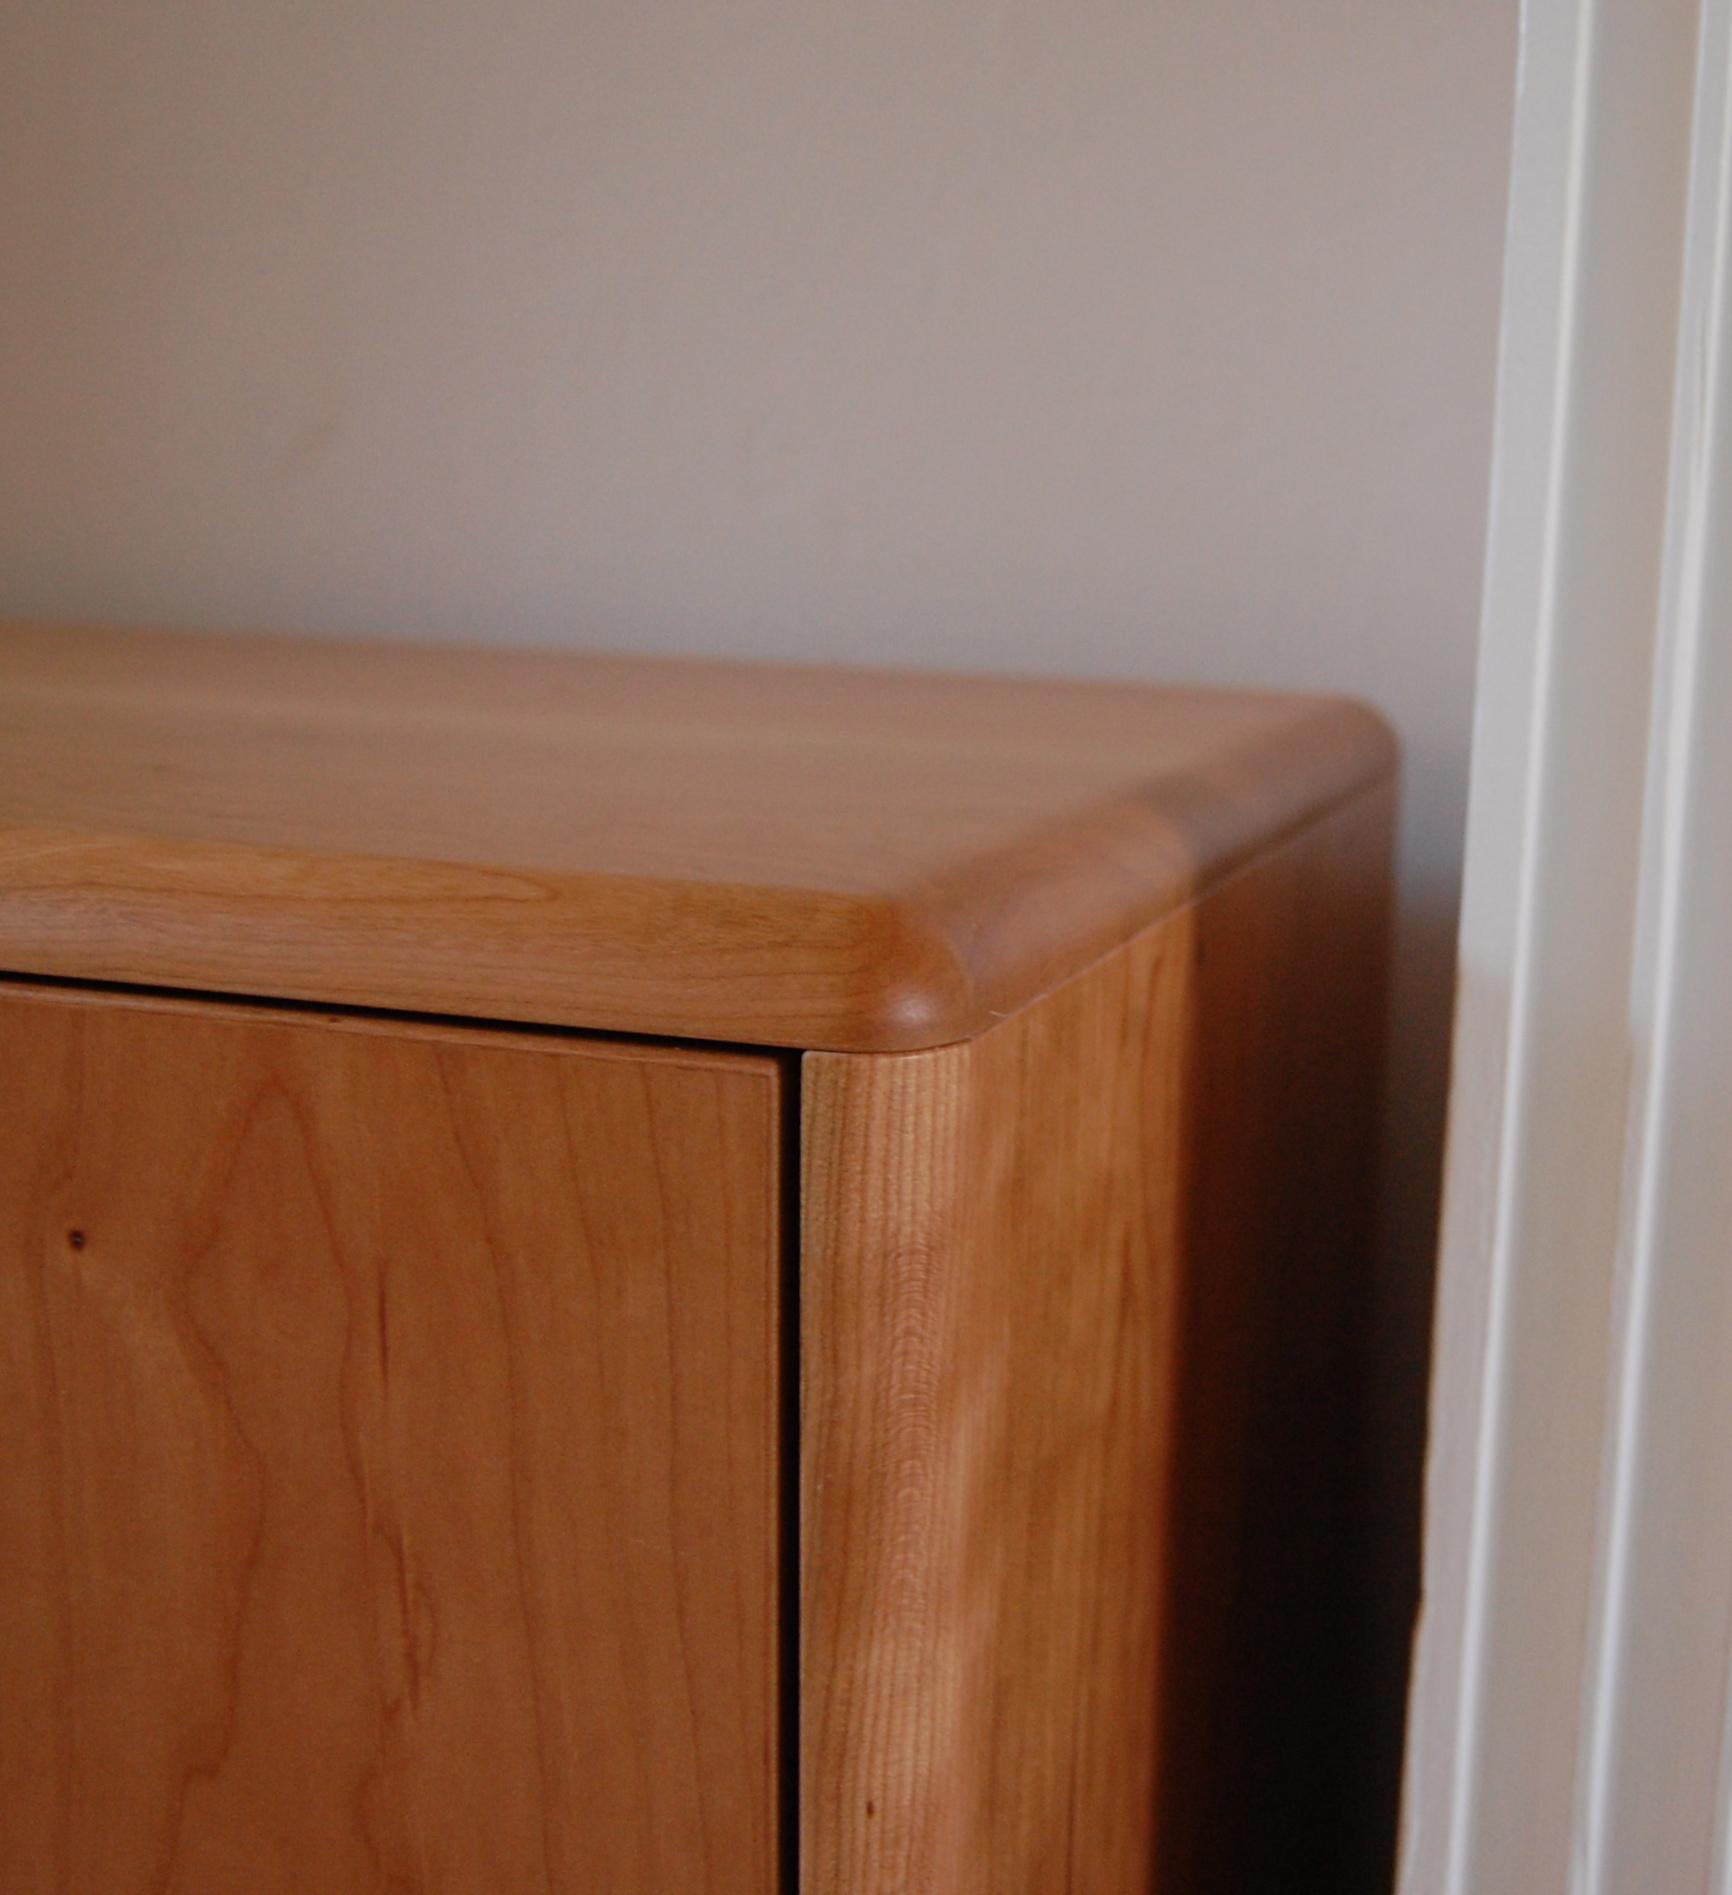 Grain_Bespoke_Furniture_Cherry_Drinks_Cabinet_2.jpg